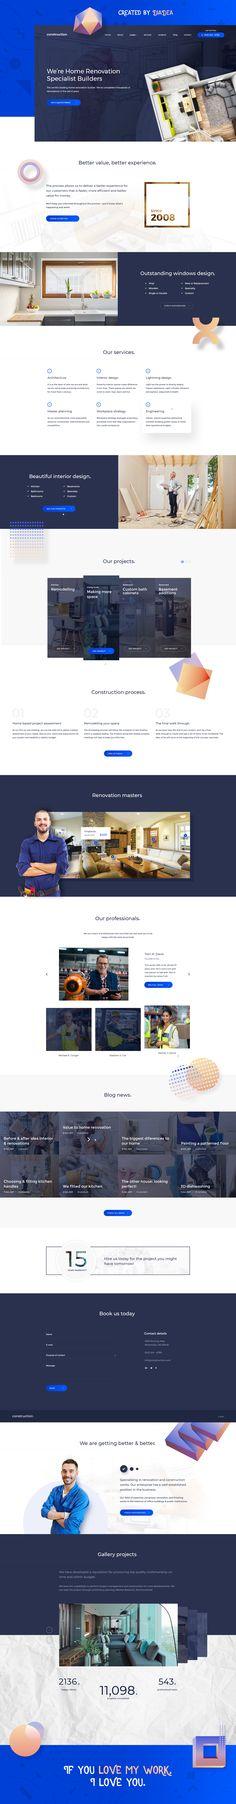 #Construction #Joomla #Template #Business #Corporate #Architect #Construct #Builder #Company #Services #Creative #Branding #Blue #Website #diadea #graphics #webdesign